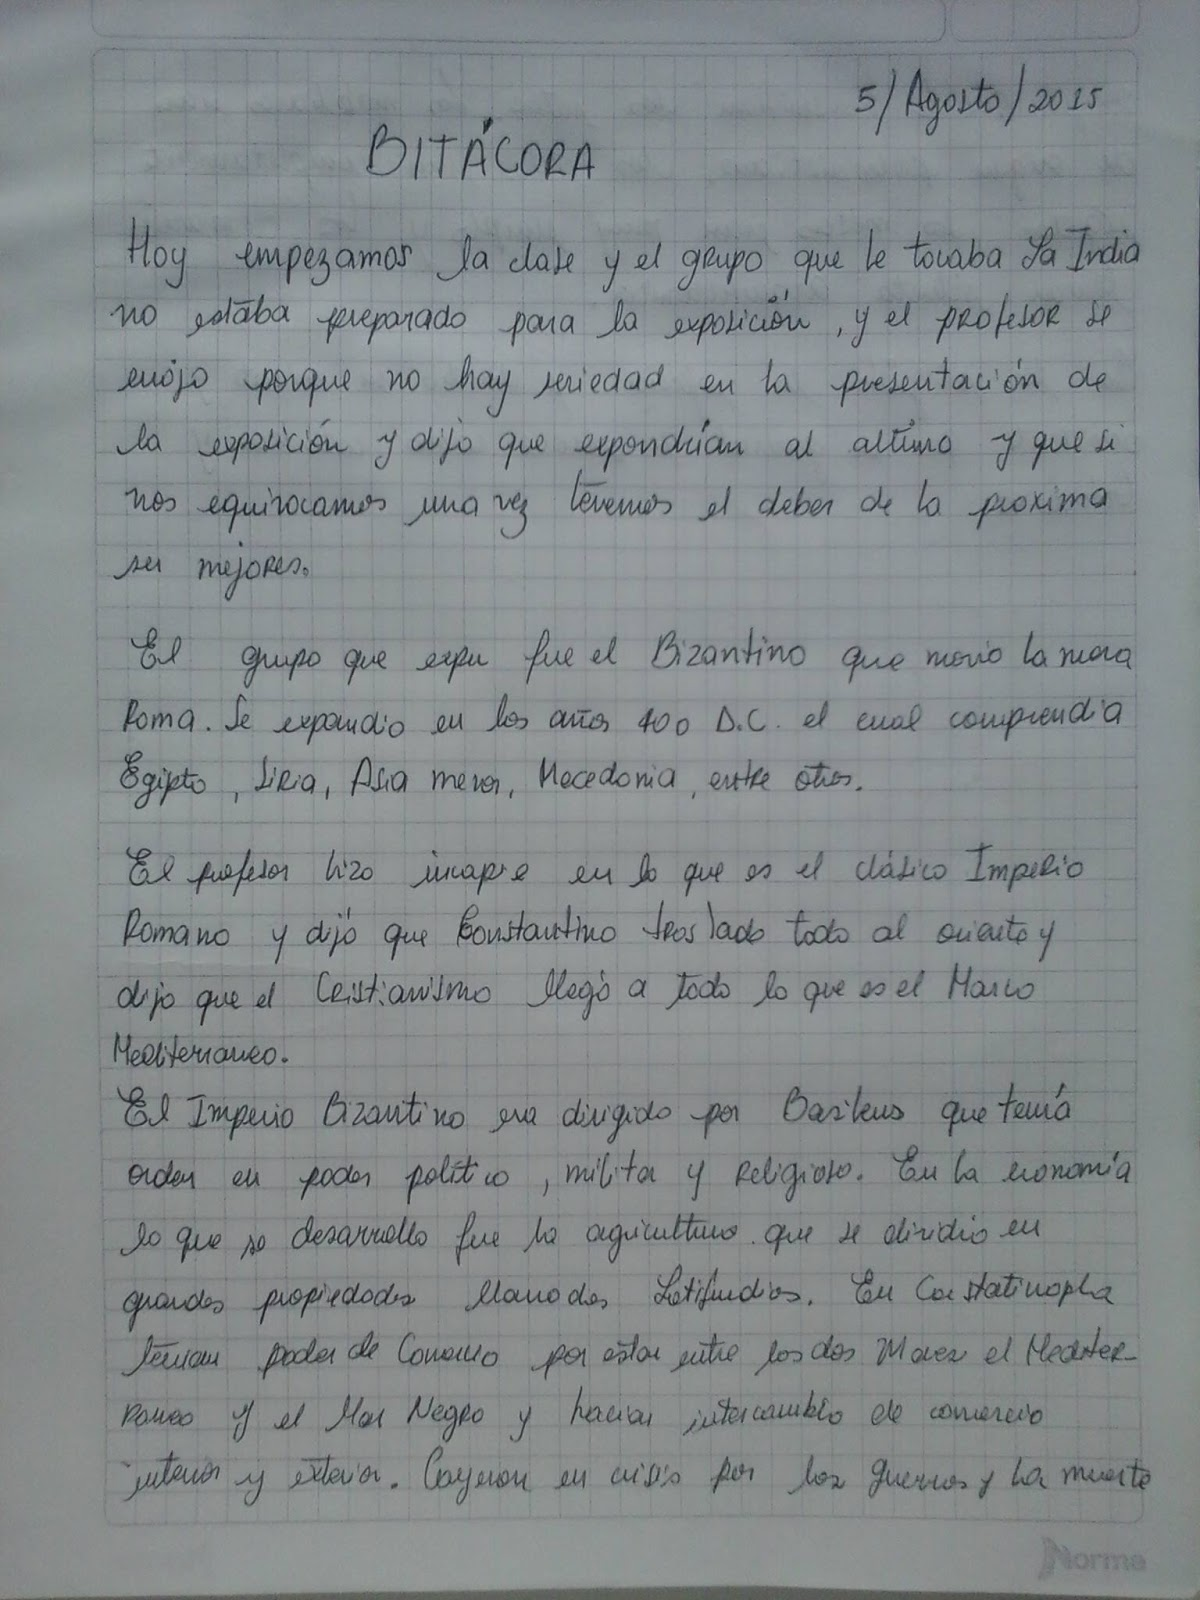 Historia Del Mueble 1 Ug # Bitacora Muebles